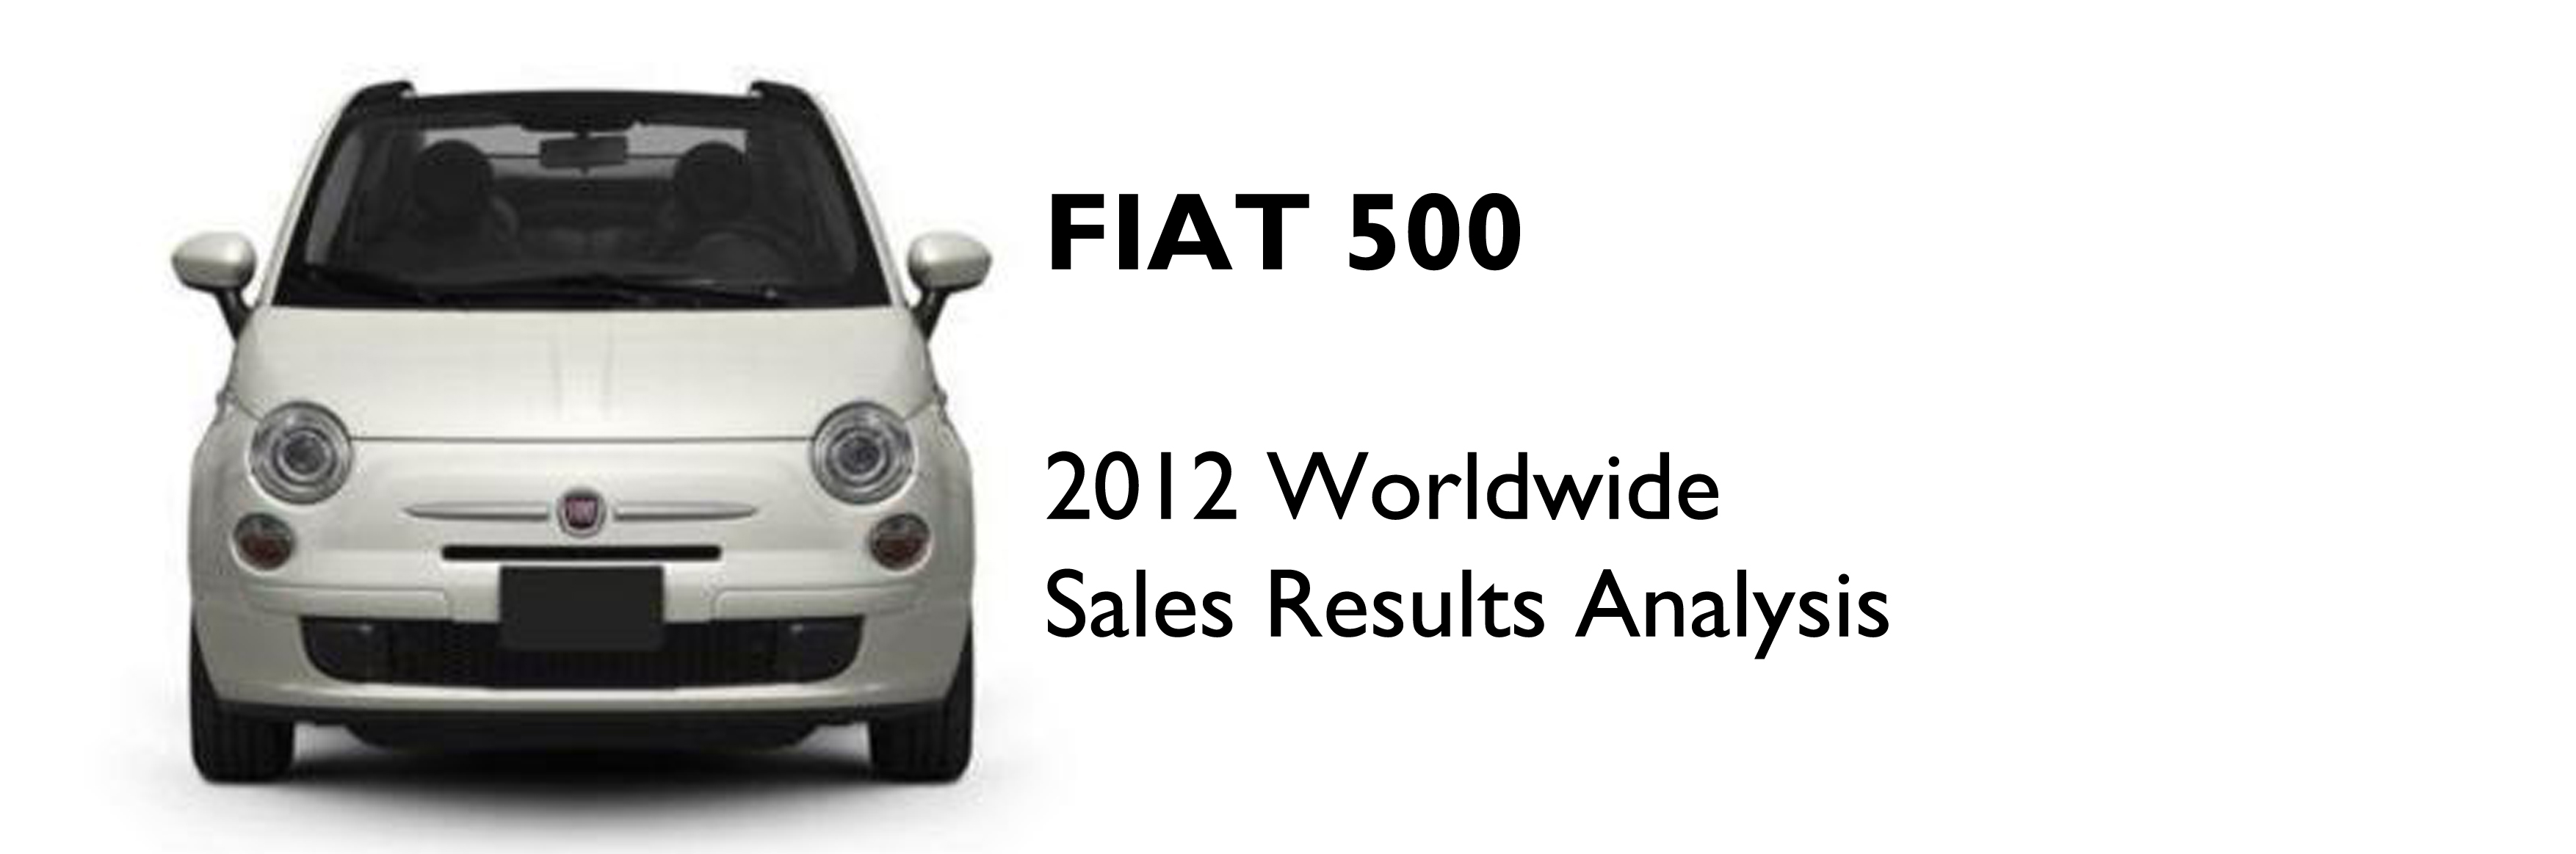 Fiat 500 2012 Full Year Analysis | Fiat Group\'s World